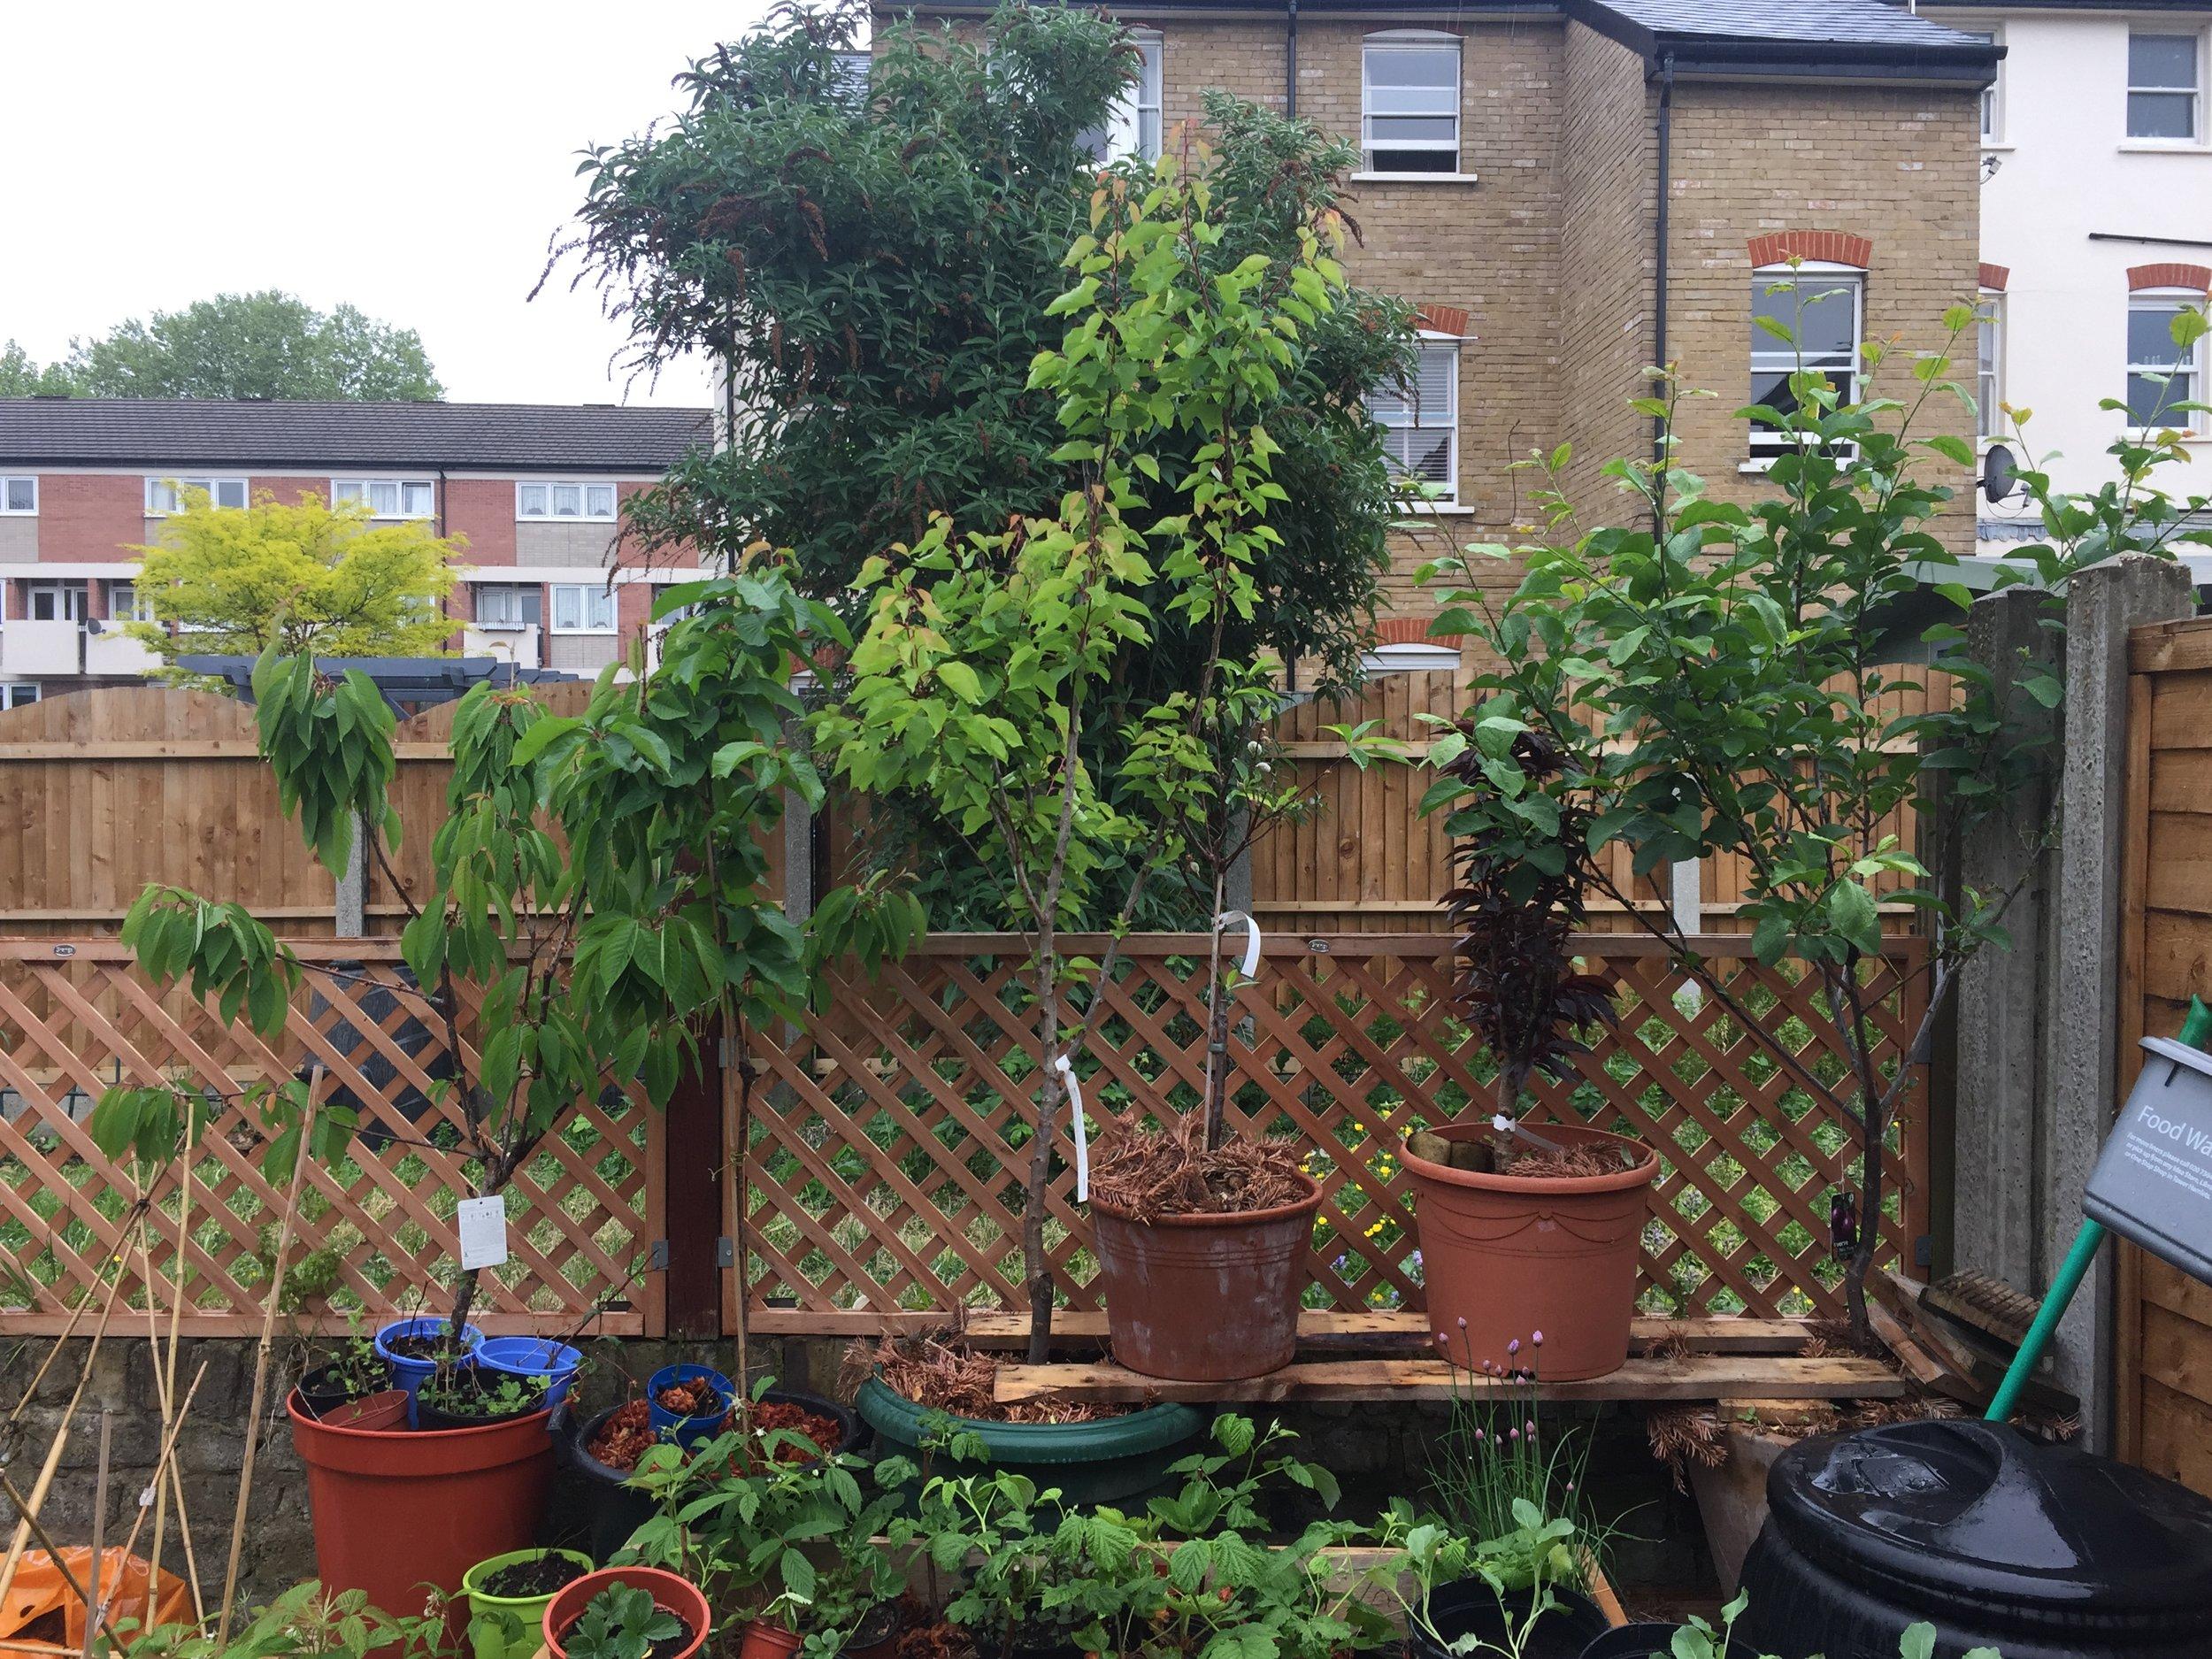 Fruit trees in our small urban garden. Cherry, cherry, nectarine, patio almond, patio peach, plum